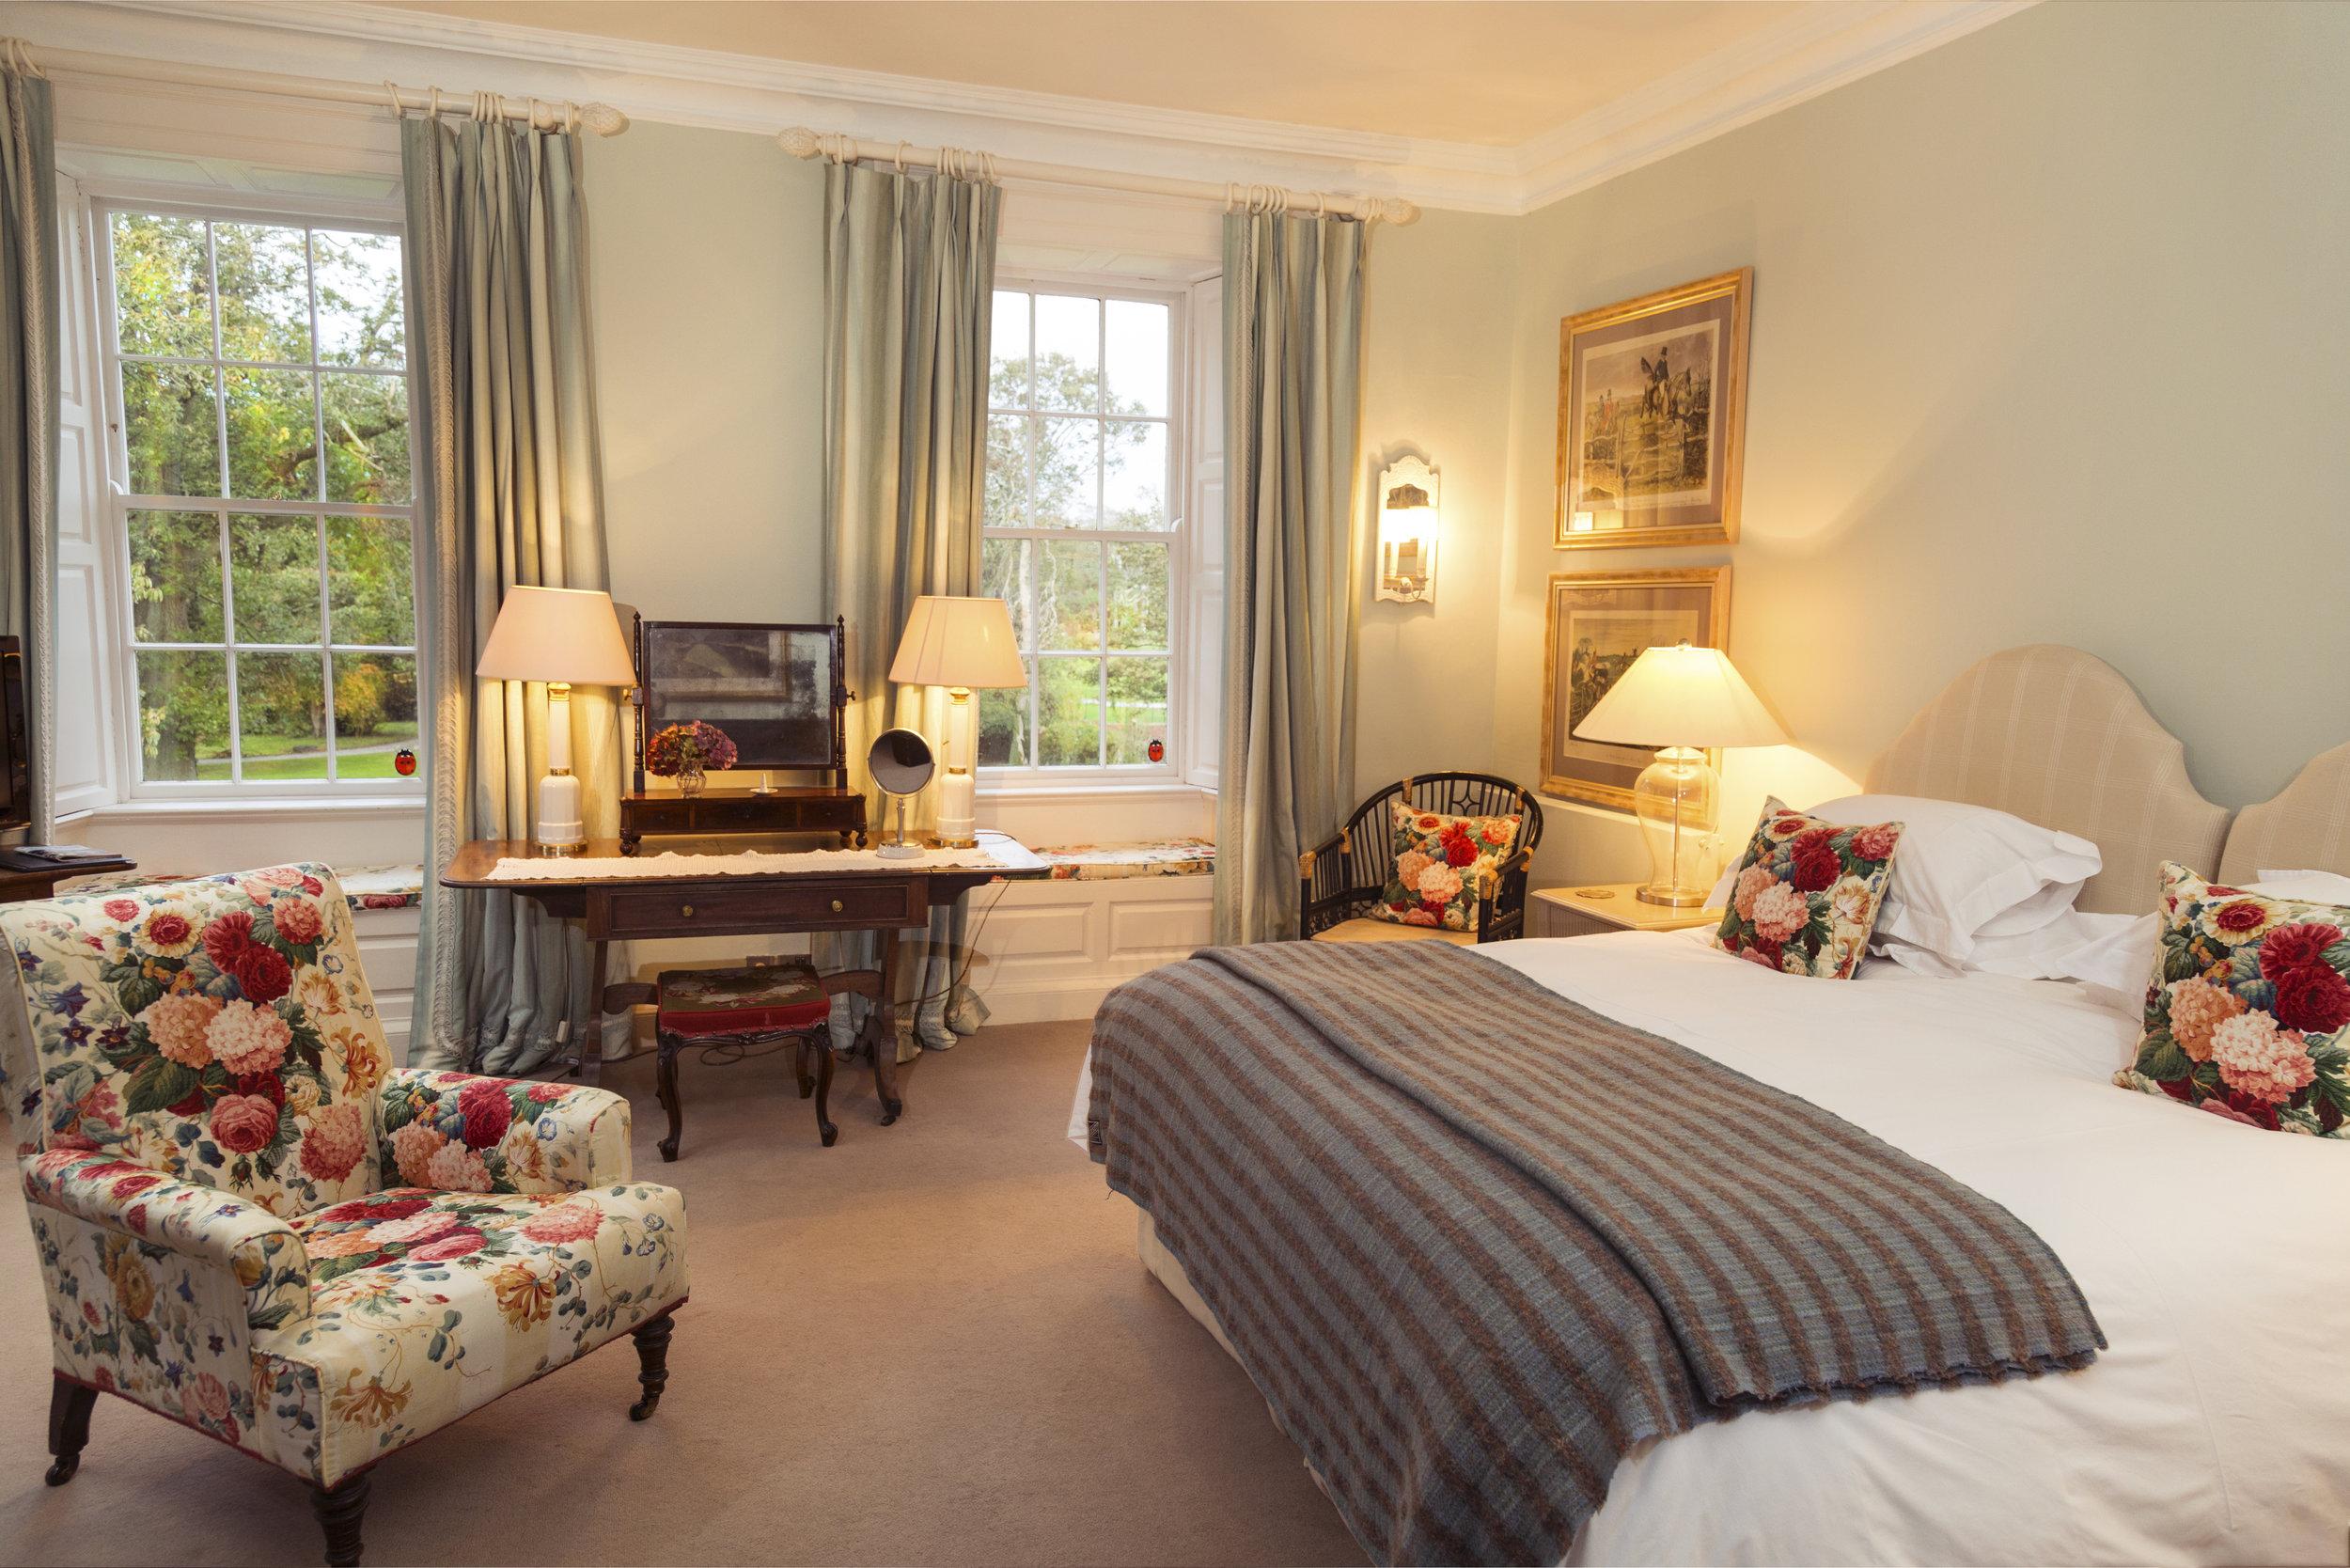 churchtownHouse_bedroom1HIRES.jpg